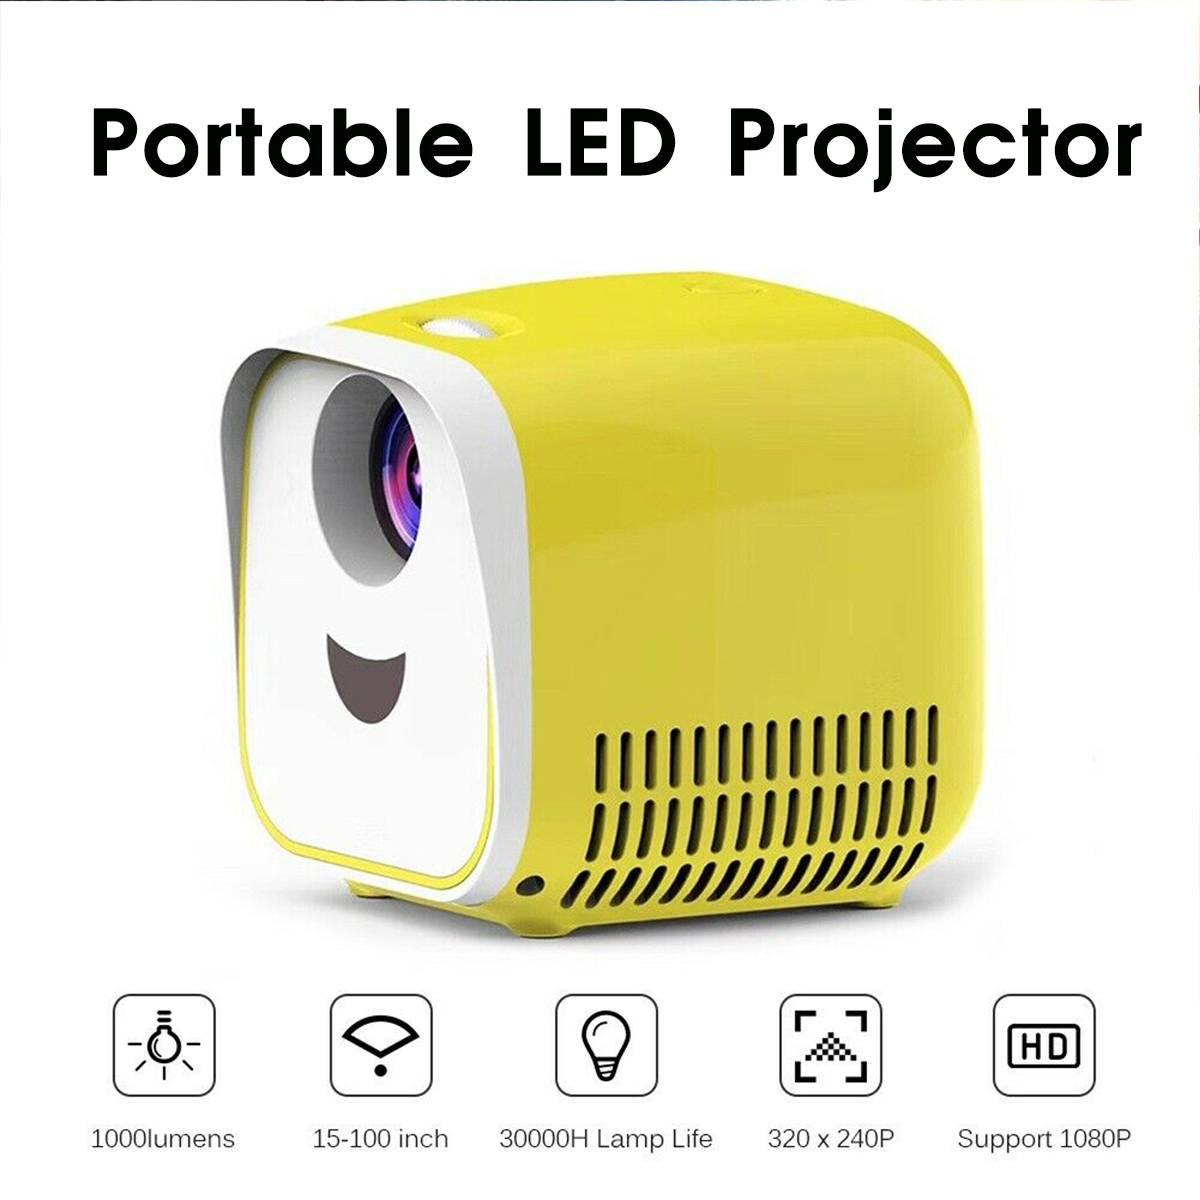 Mini Projektor 1000Lumen Tragbare Projektor Kinder Bildung Mini FÜHRTE Hause Beamer 4k projektor 4K led projektor für weihnachten